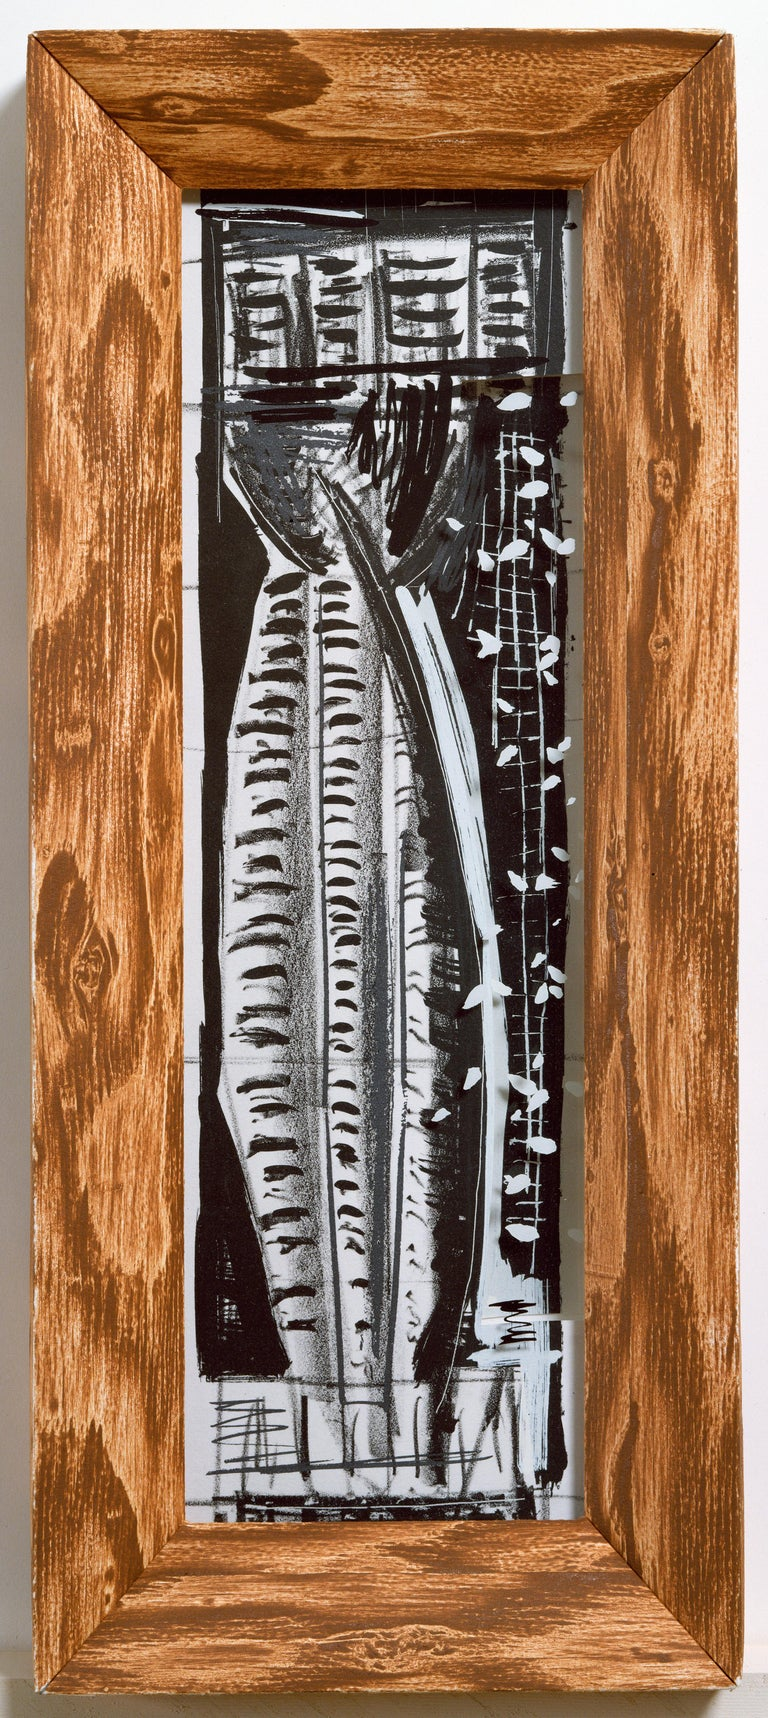 Michael Hurson Figurative Print - Vladimir: Greek column abstract etching and screenprint, handmade paper frame